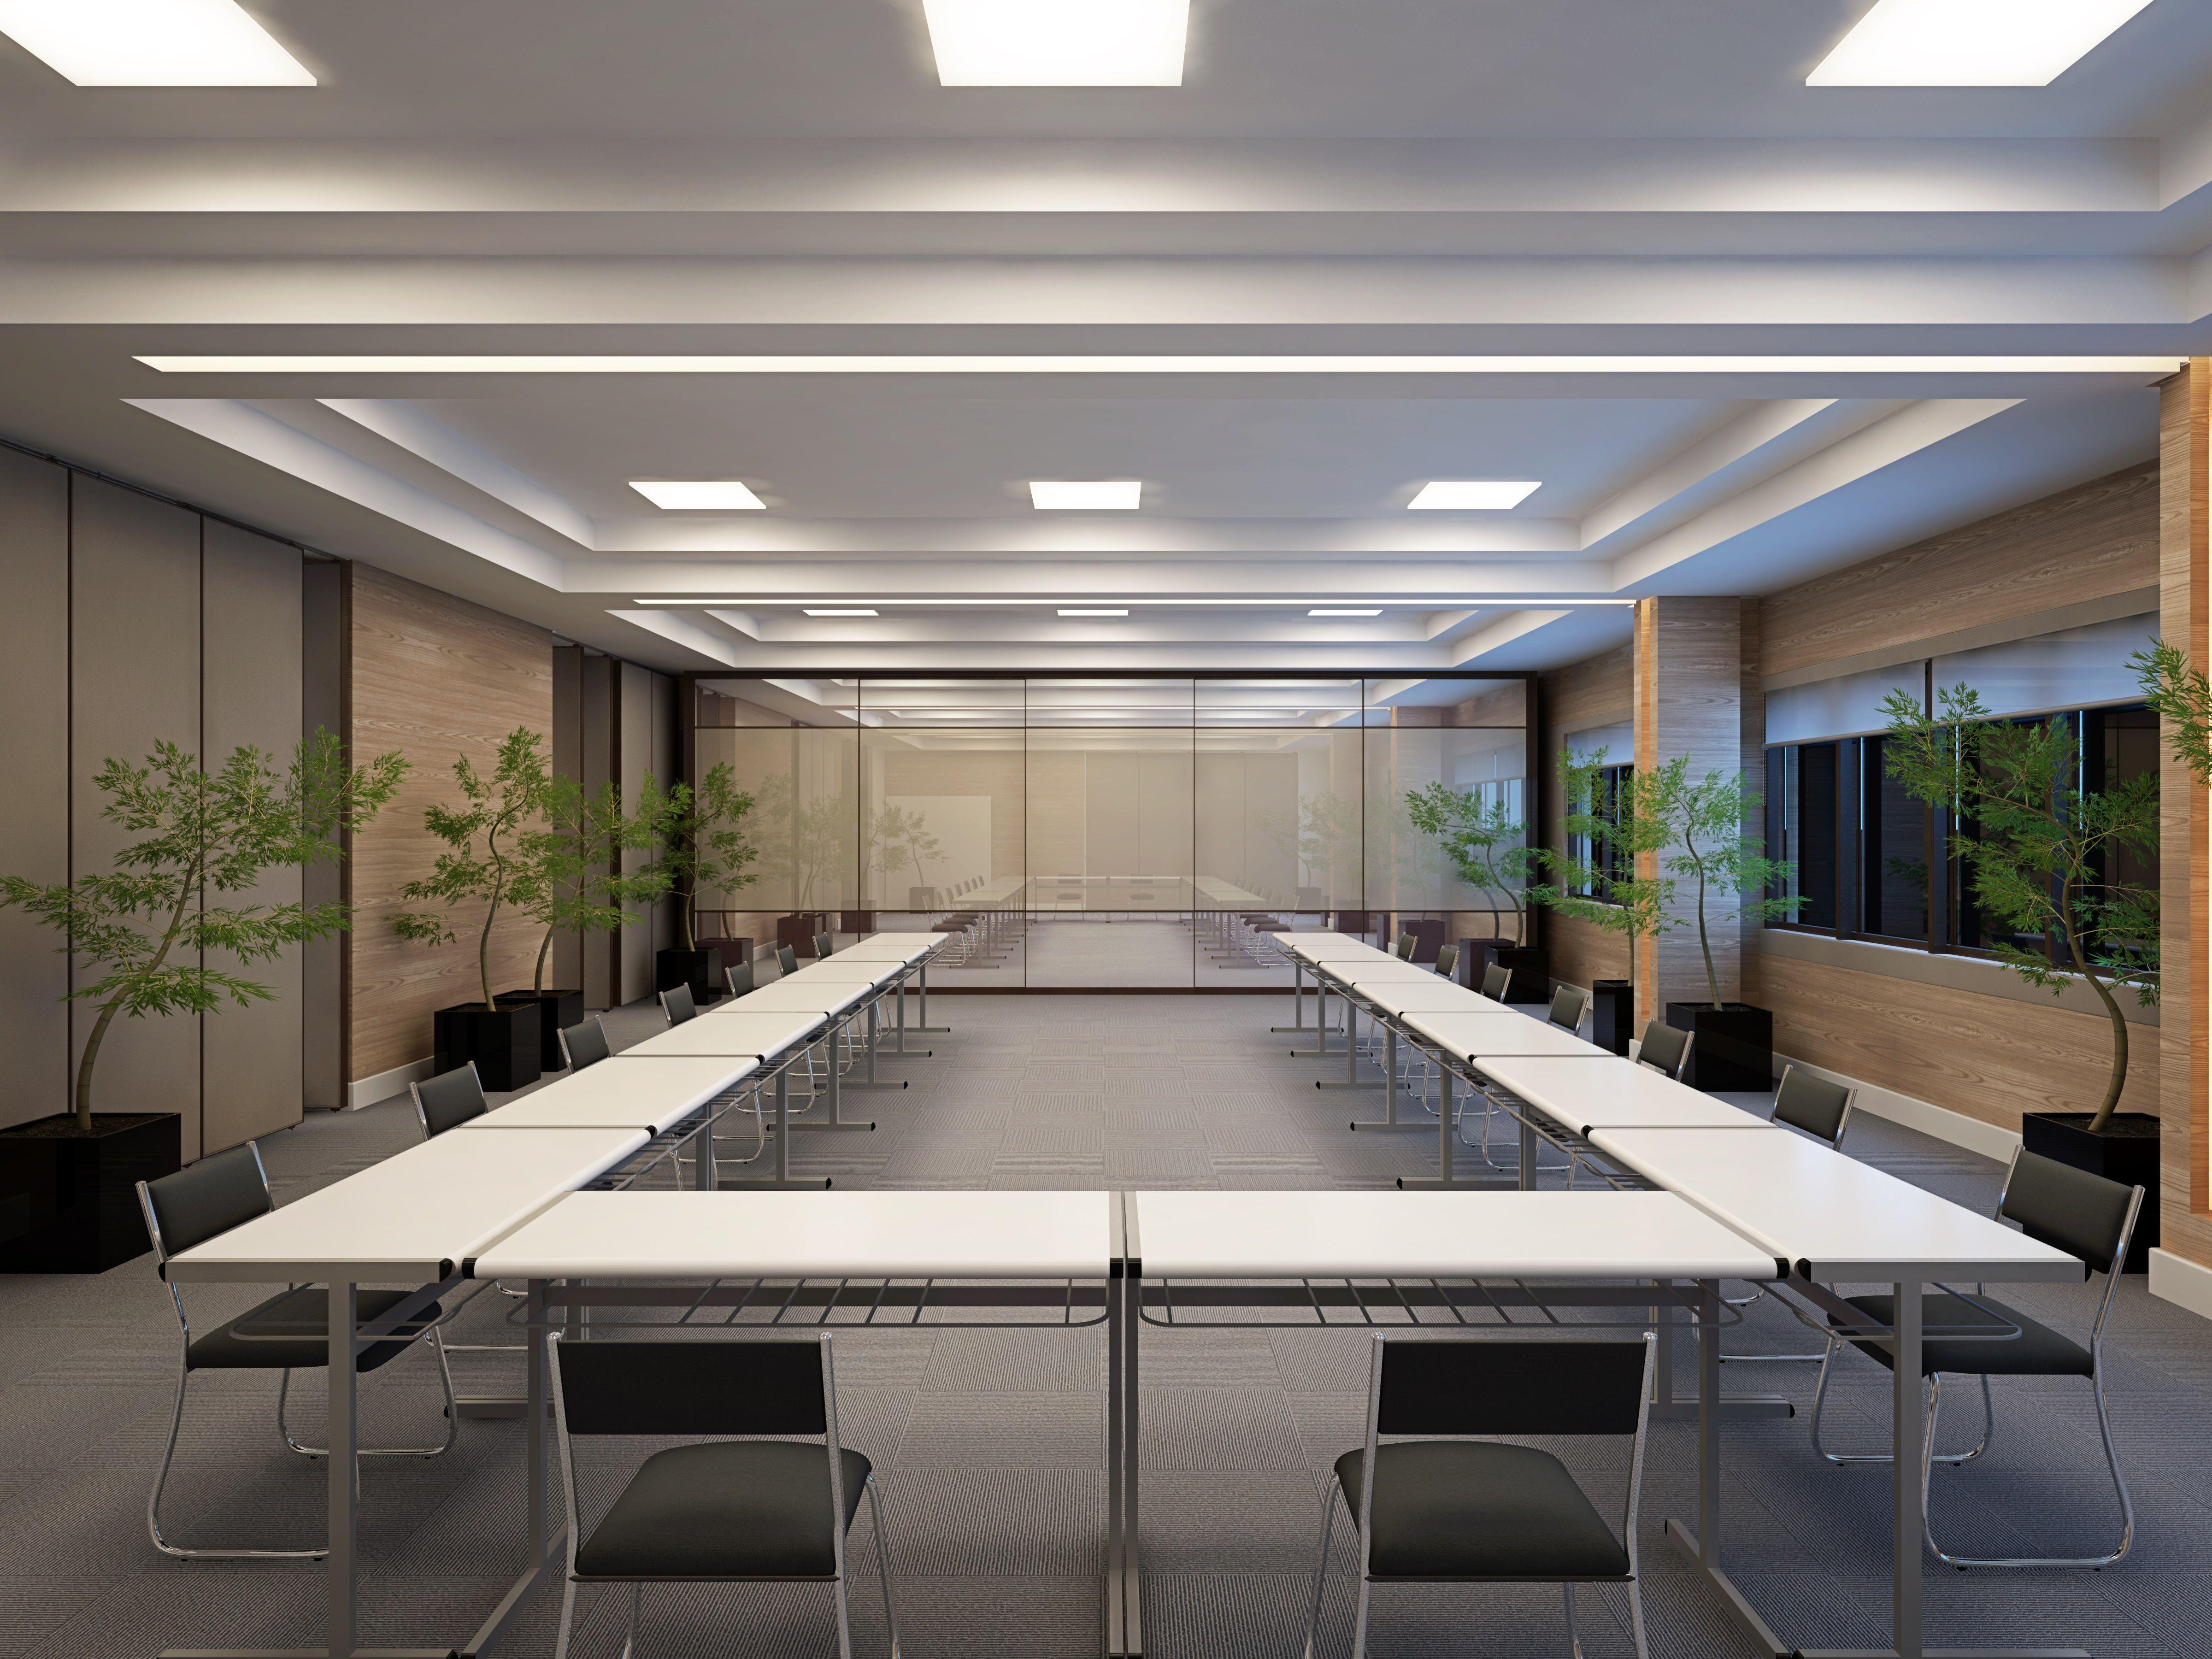 Sala Layout Reuniao Edificio Uso Misto Axis Projeto